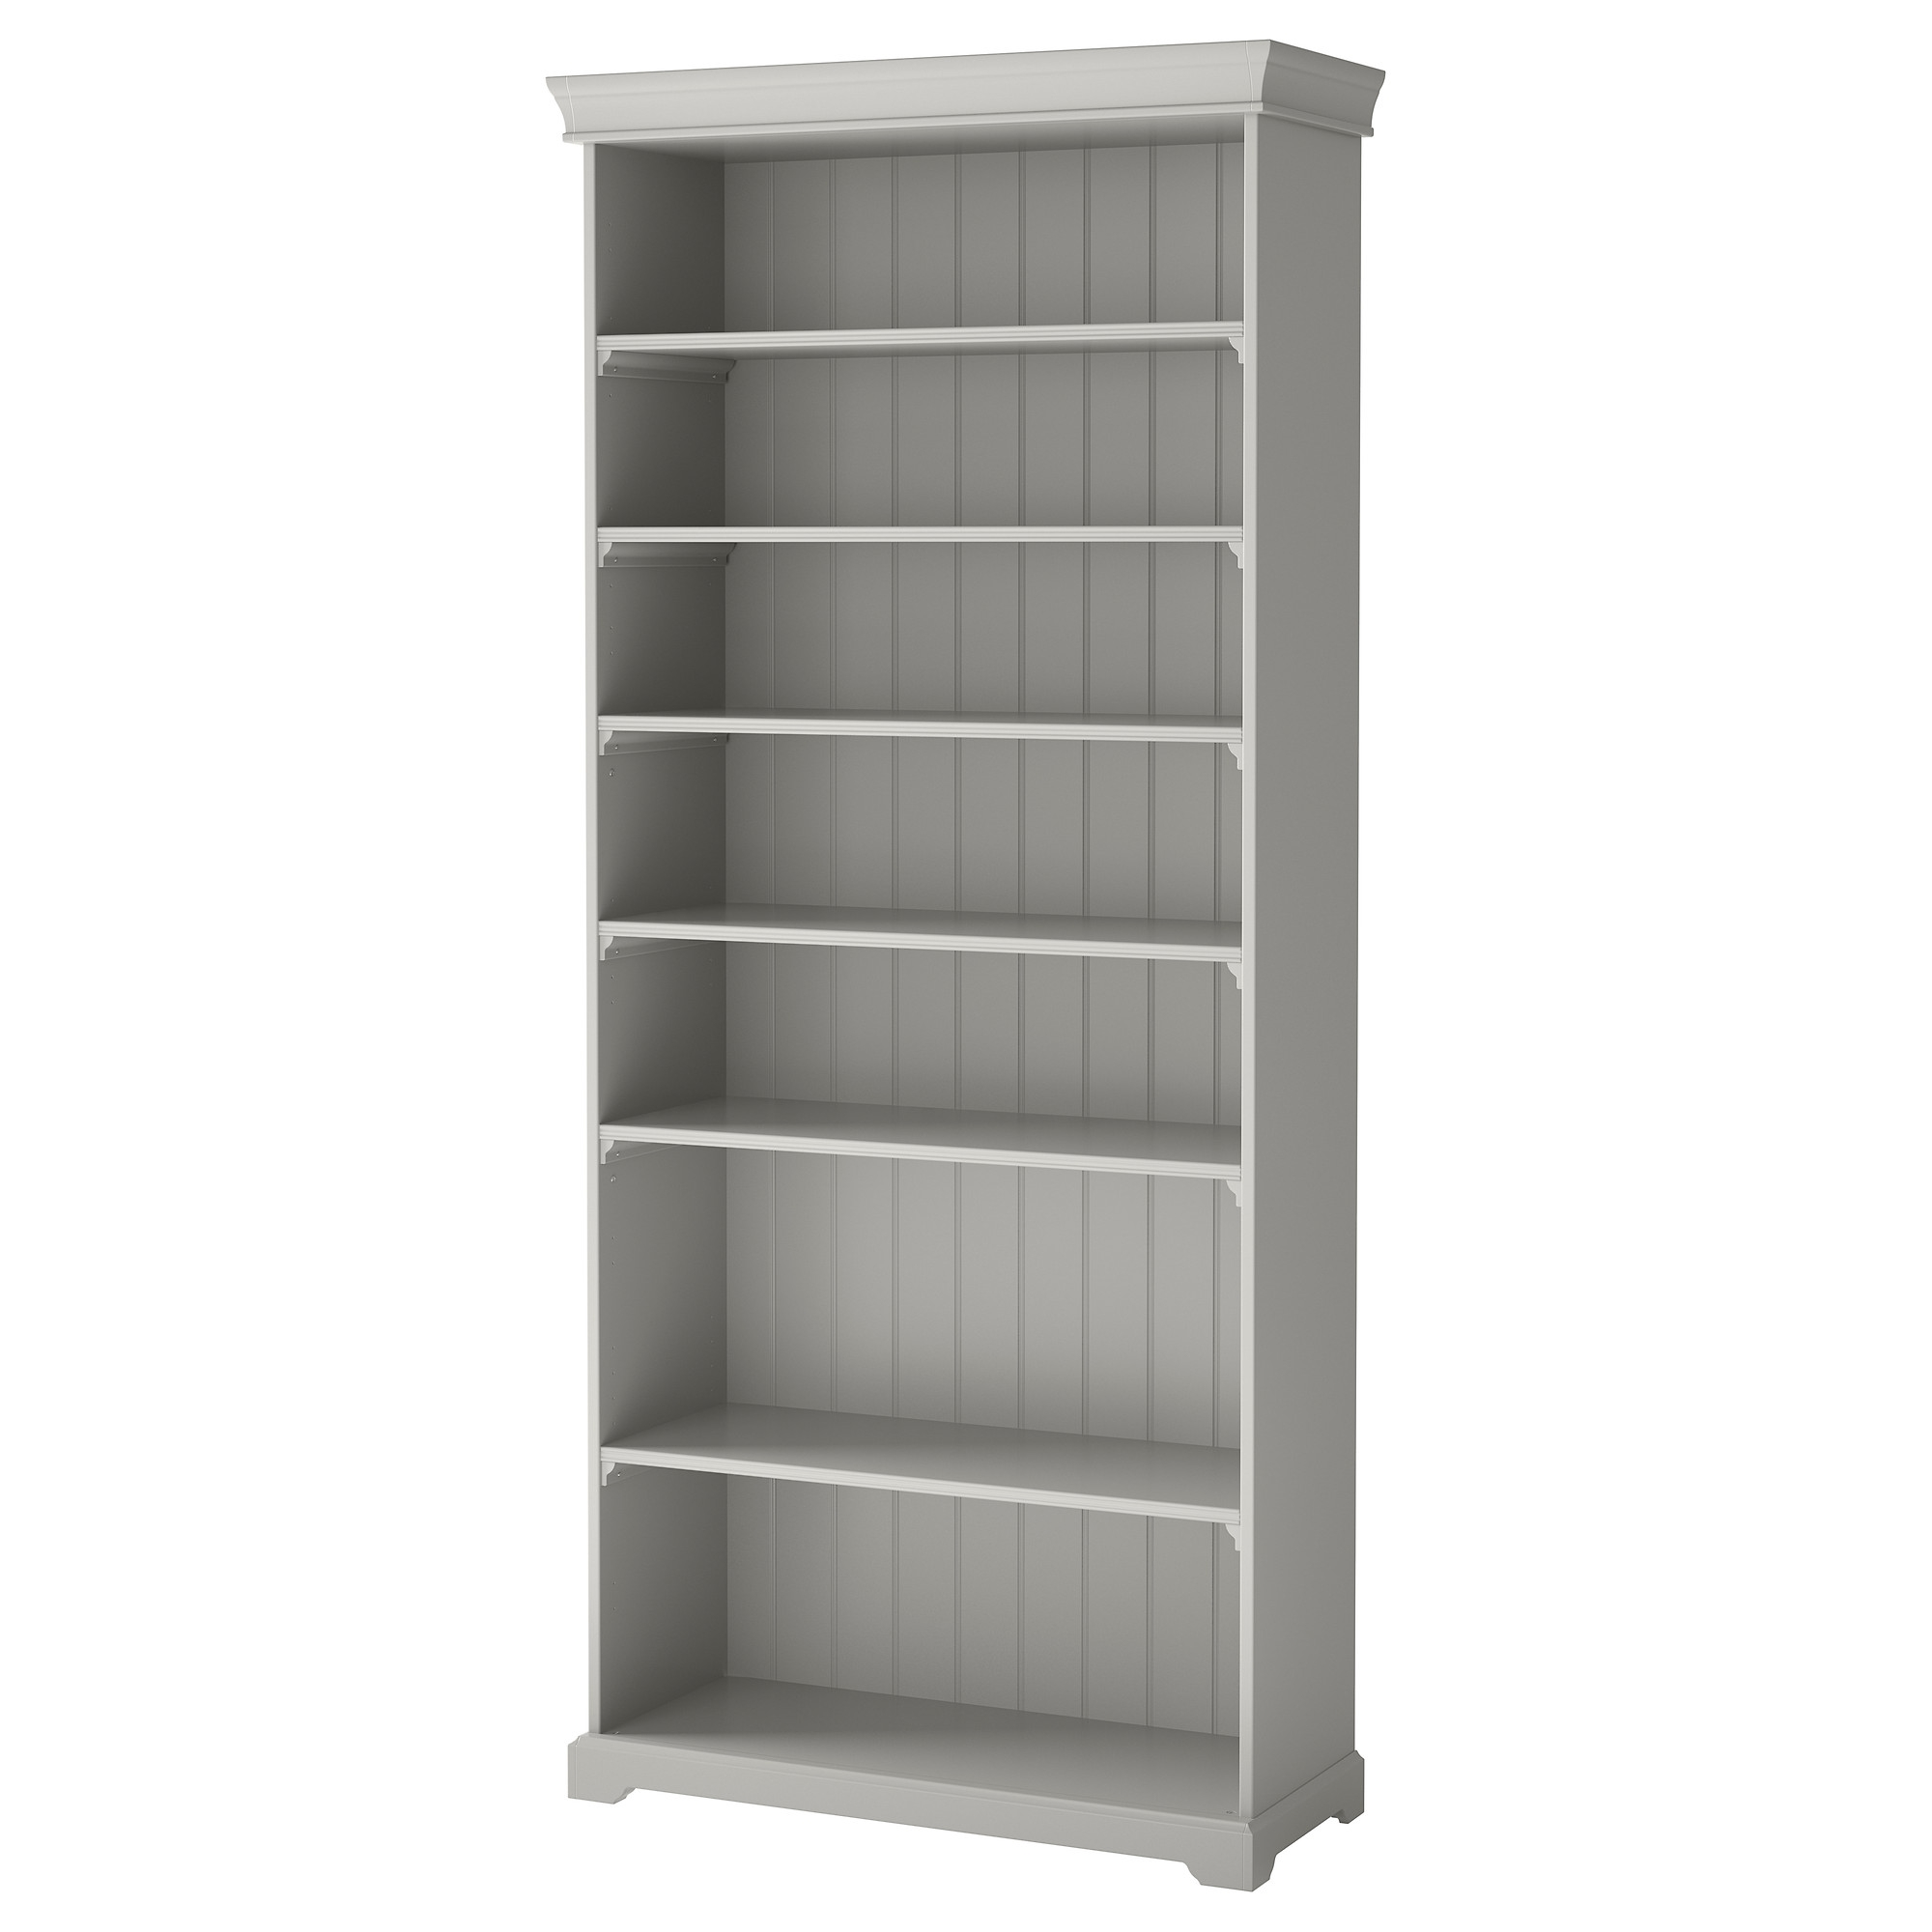 Liatorp Bookcase White Ikea Regarding Tall Bookcases (View 9 of 15)